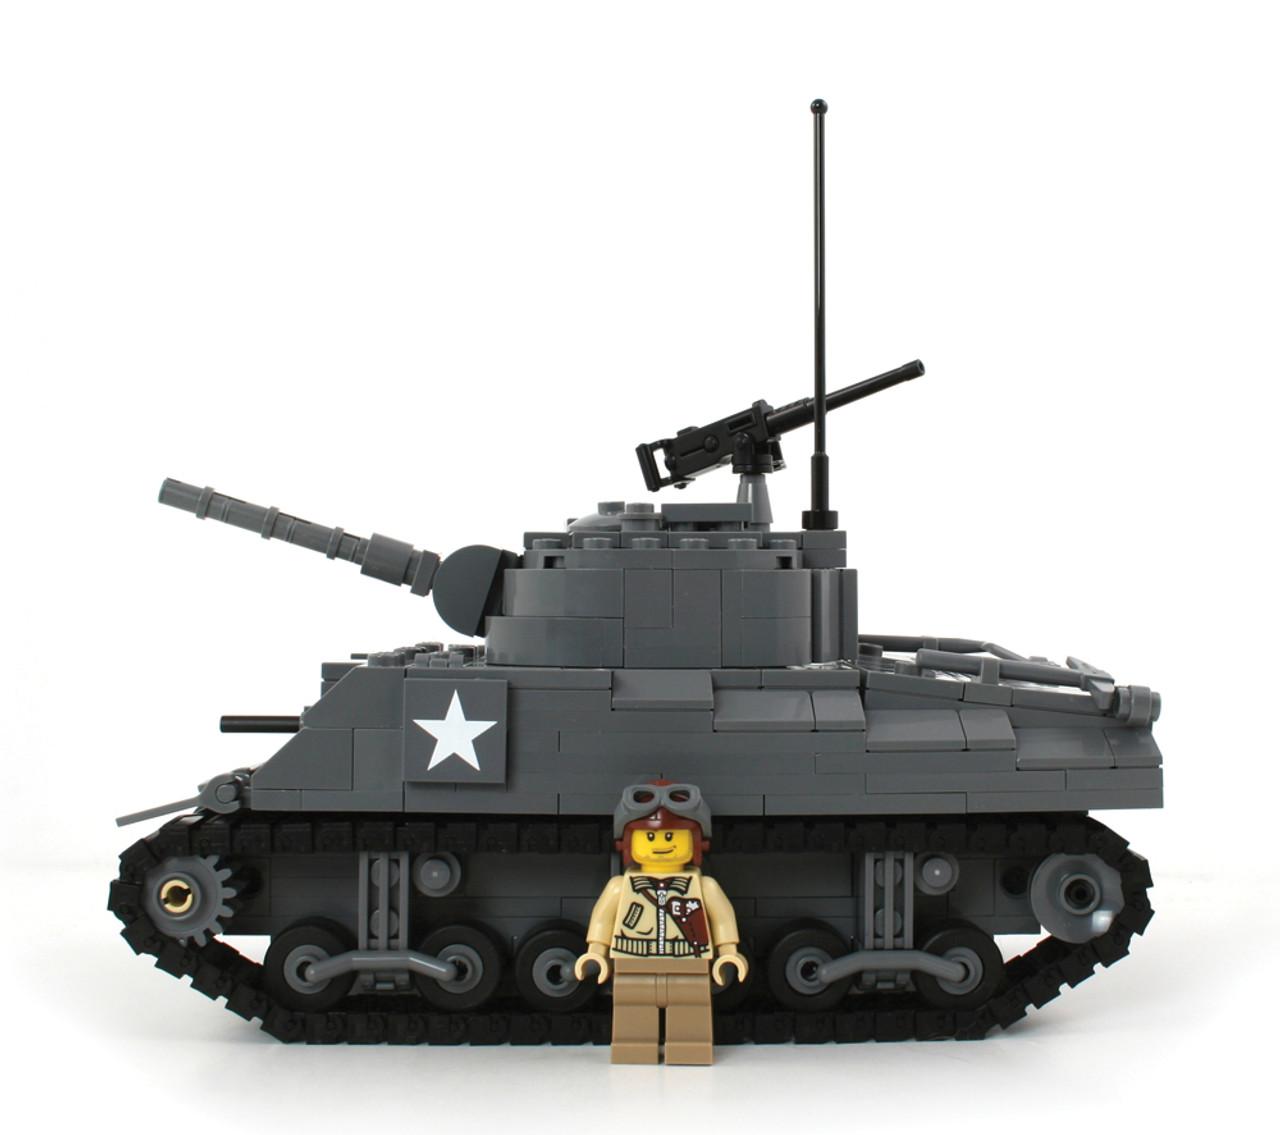 M4 Sherman - Allied Medium Tank